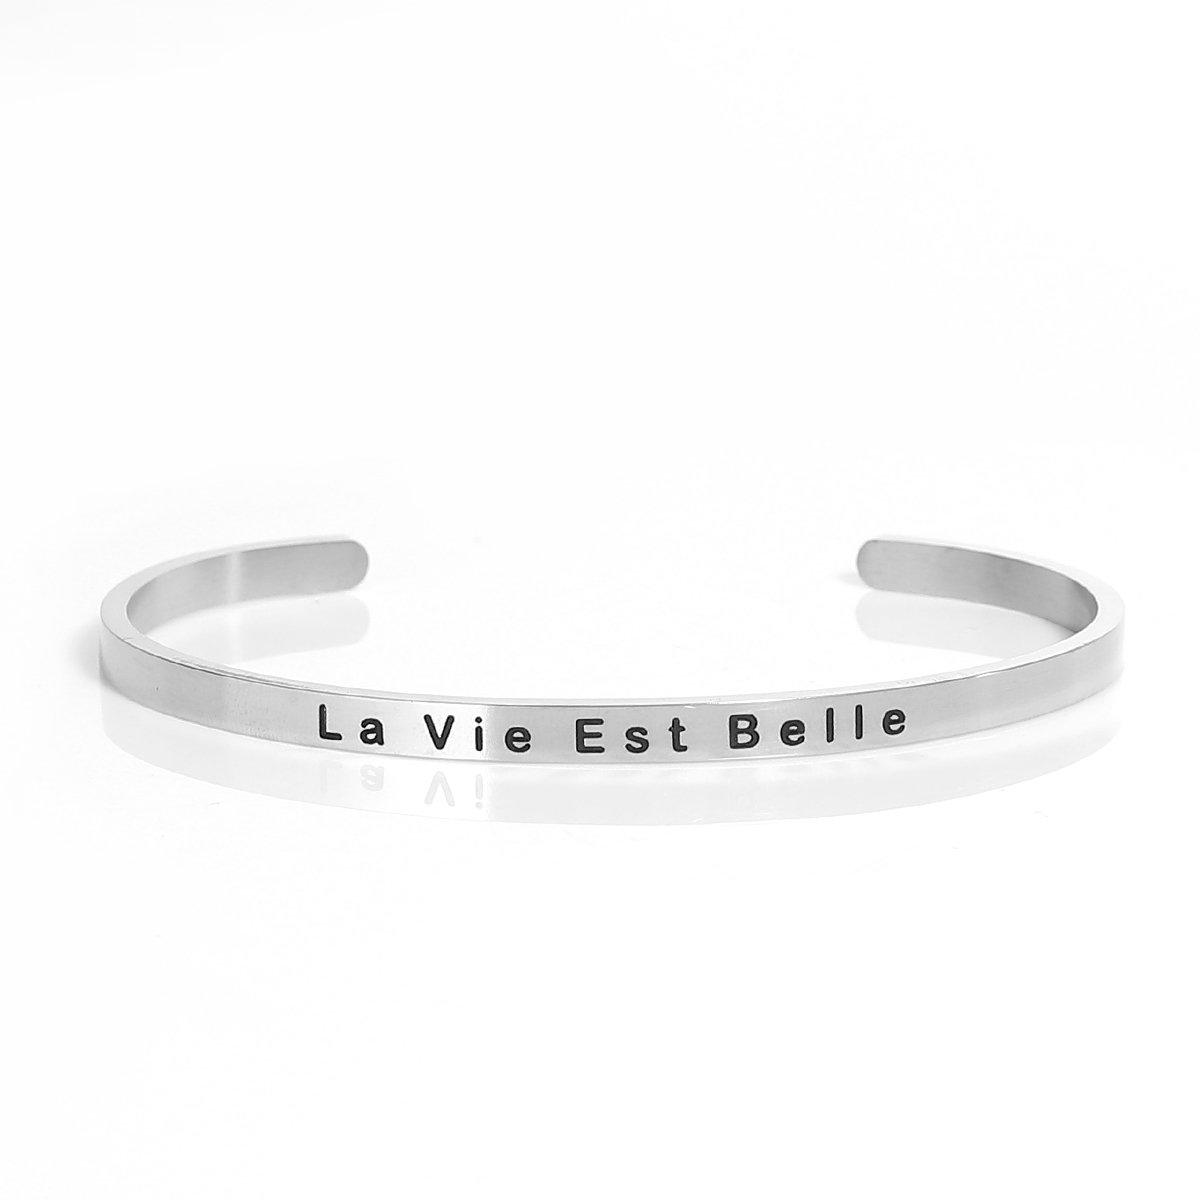 Sexy Sparkles Stainless Steel La Vie Est Belle Life Is Beautiful Positive Quotes Energy Open Cuff Bangle Bracelet 4745